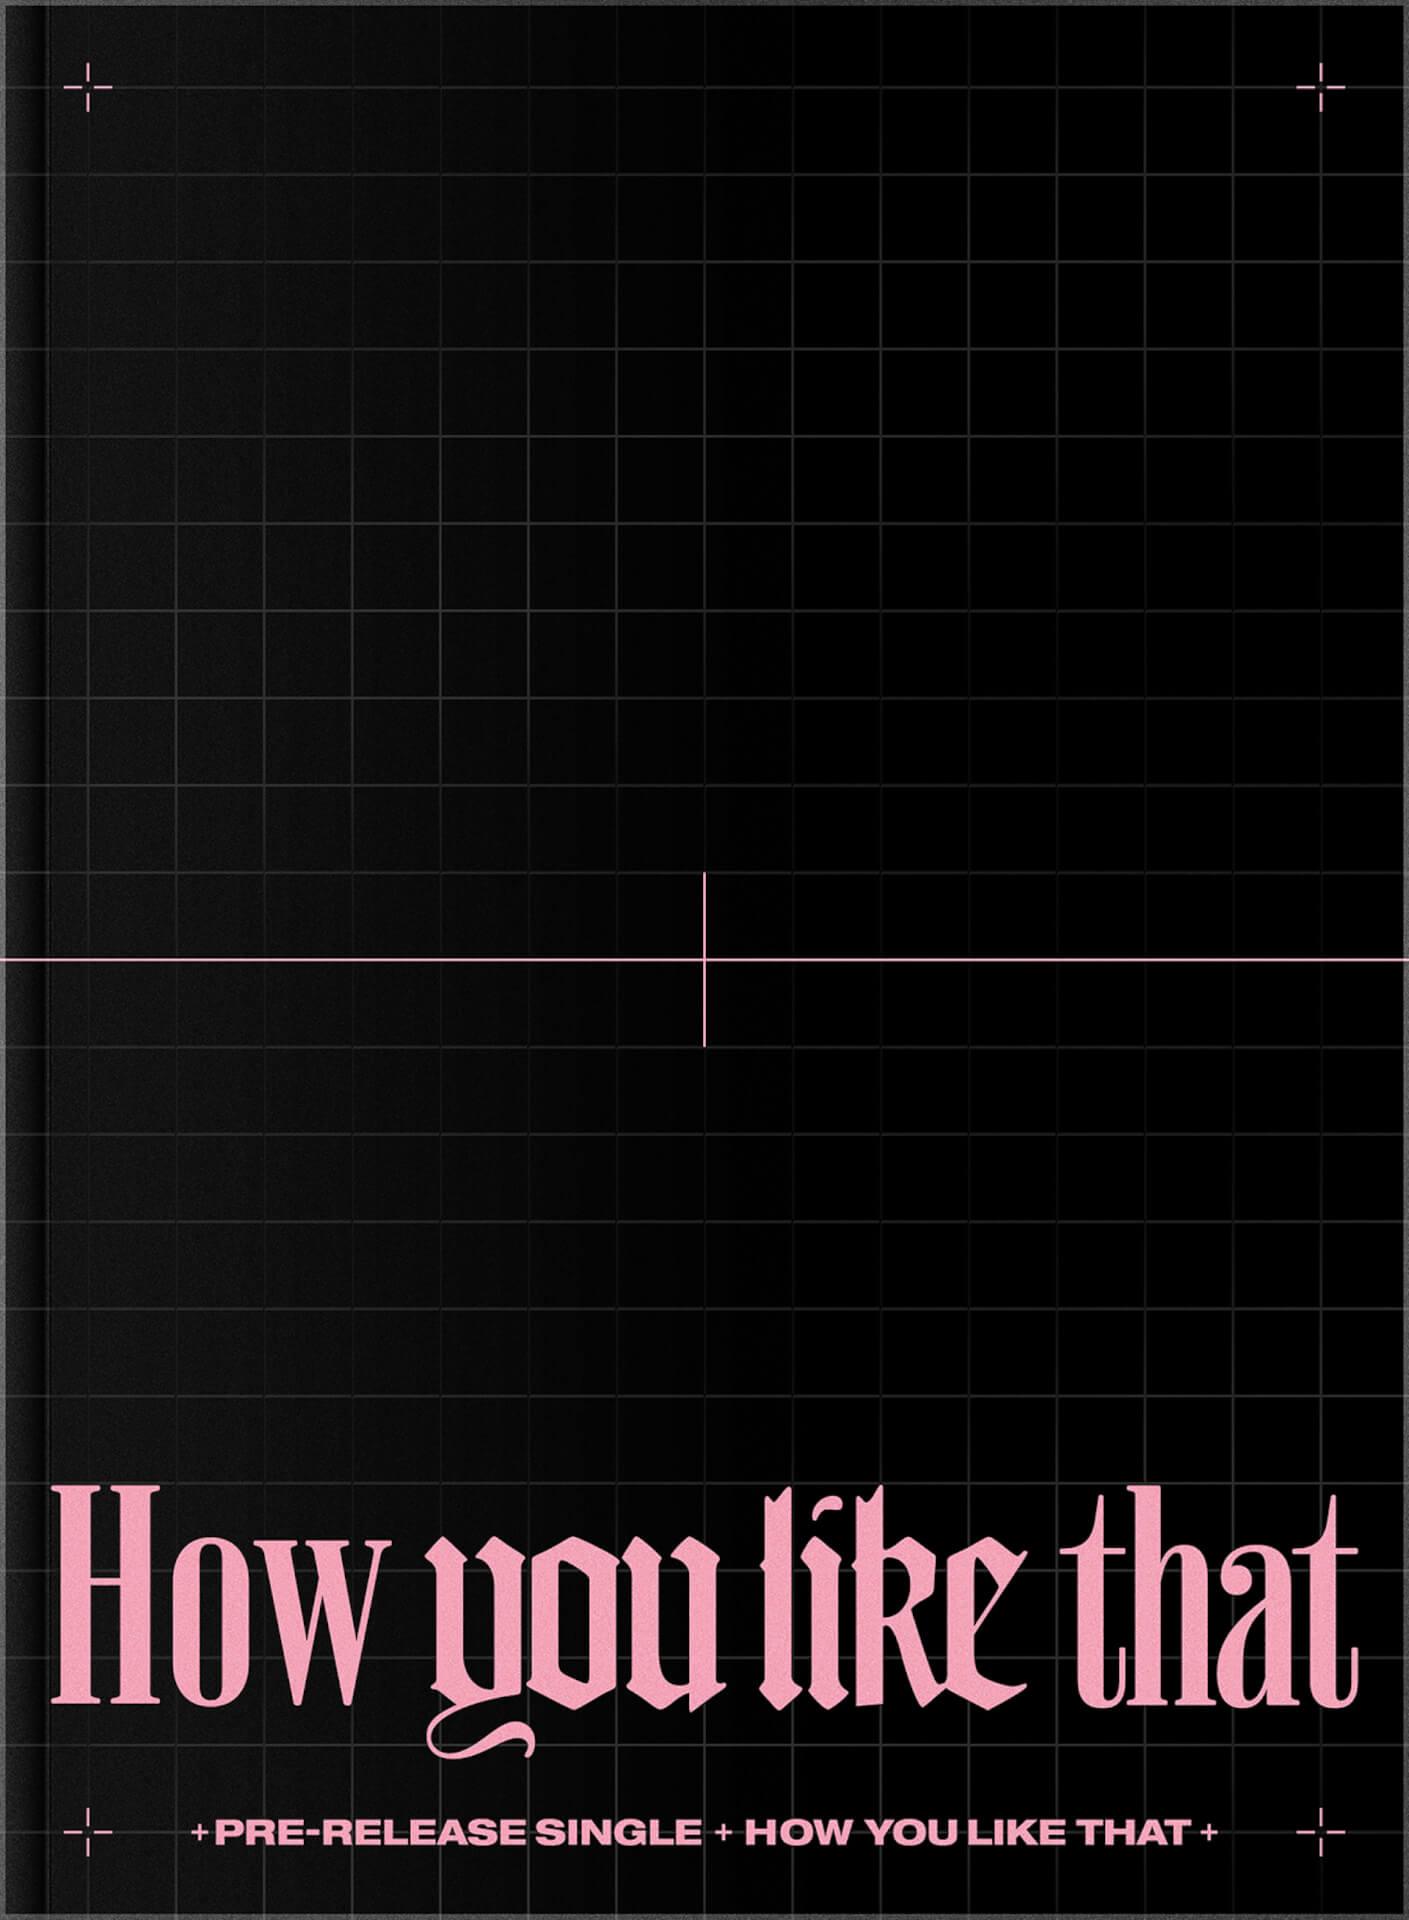 "BLACKPINKが1年2ヶ月ぶりの新曲""How You Like That""を配信リリース!MV公開でSNS大反響&SPECIAL EDITION予約販売も開始 music200626_blackpink_4"